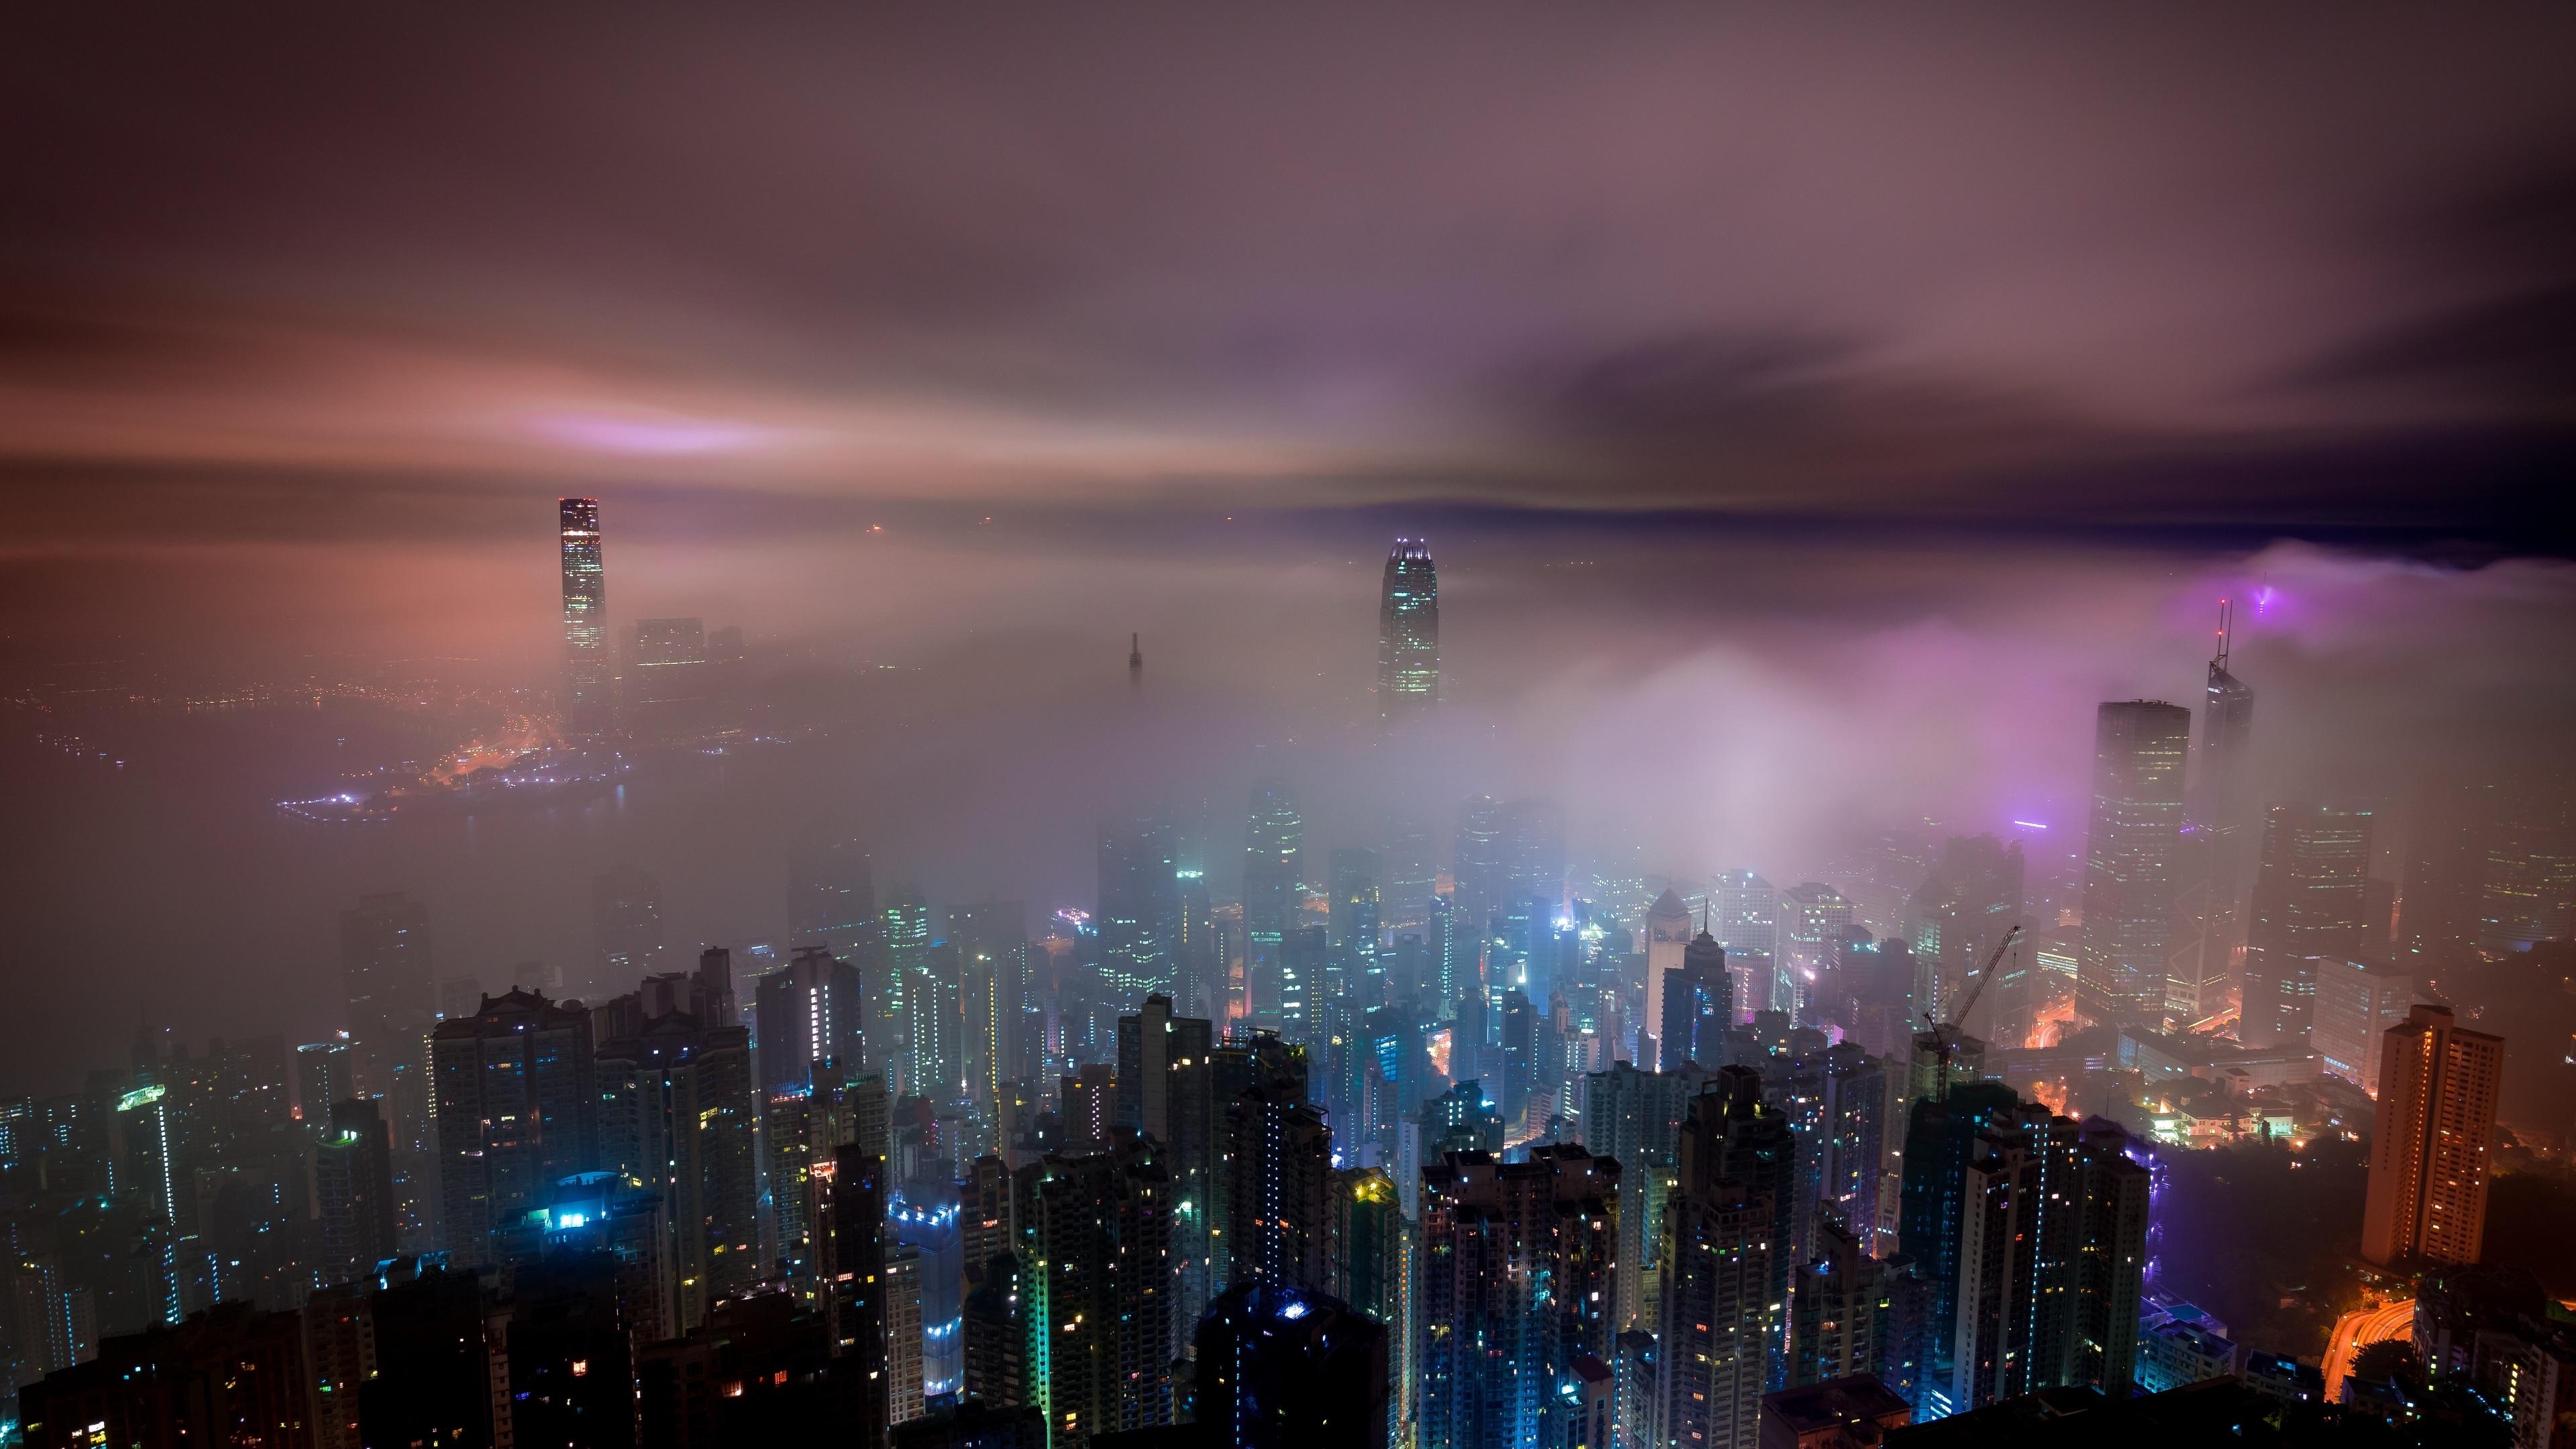 hong kong buildings night lights mist 1538069334 - Hong Kong Buildings Night Lights Mist - world wallpapers, mist wallpapers, lights wallpapers, hong kong wallpapers, hd-wallpapers, city wallpapers, buildings wallpapers, 5k wallpapers, 4k-wallpapers